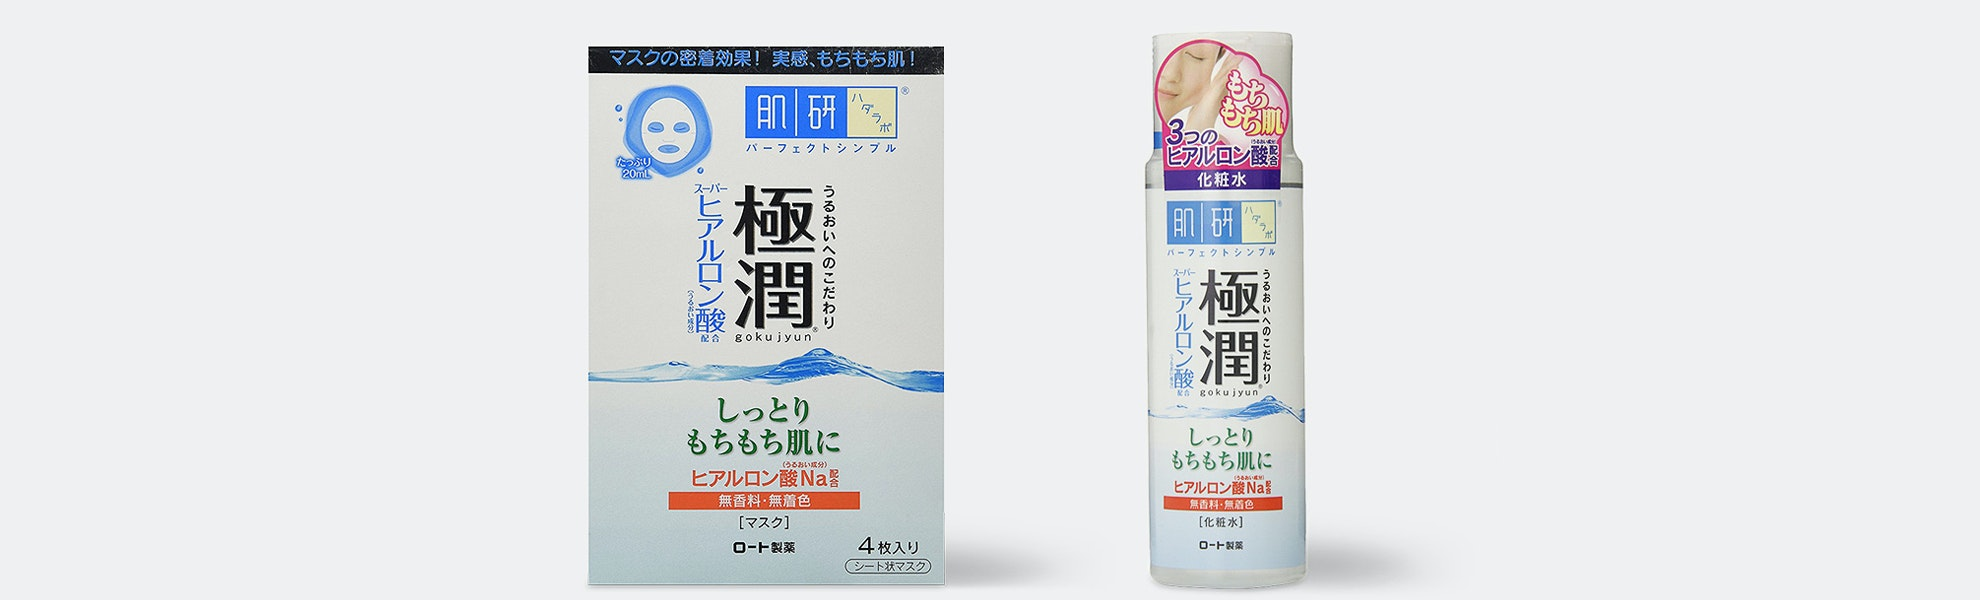 Hada Labo Gokujyun Hyaluronic Masks & Toner Set